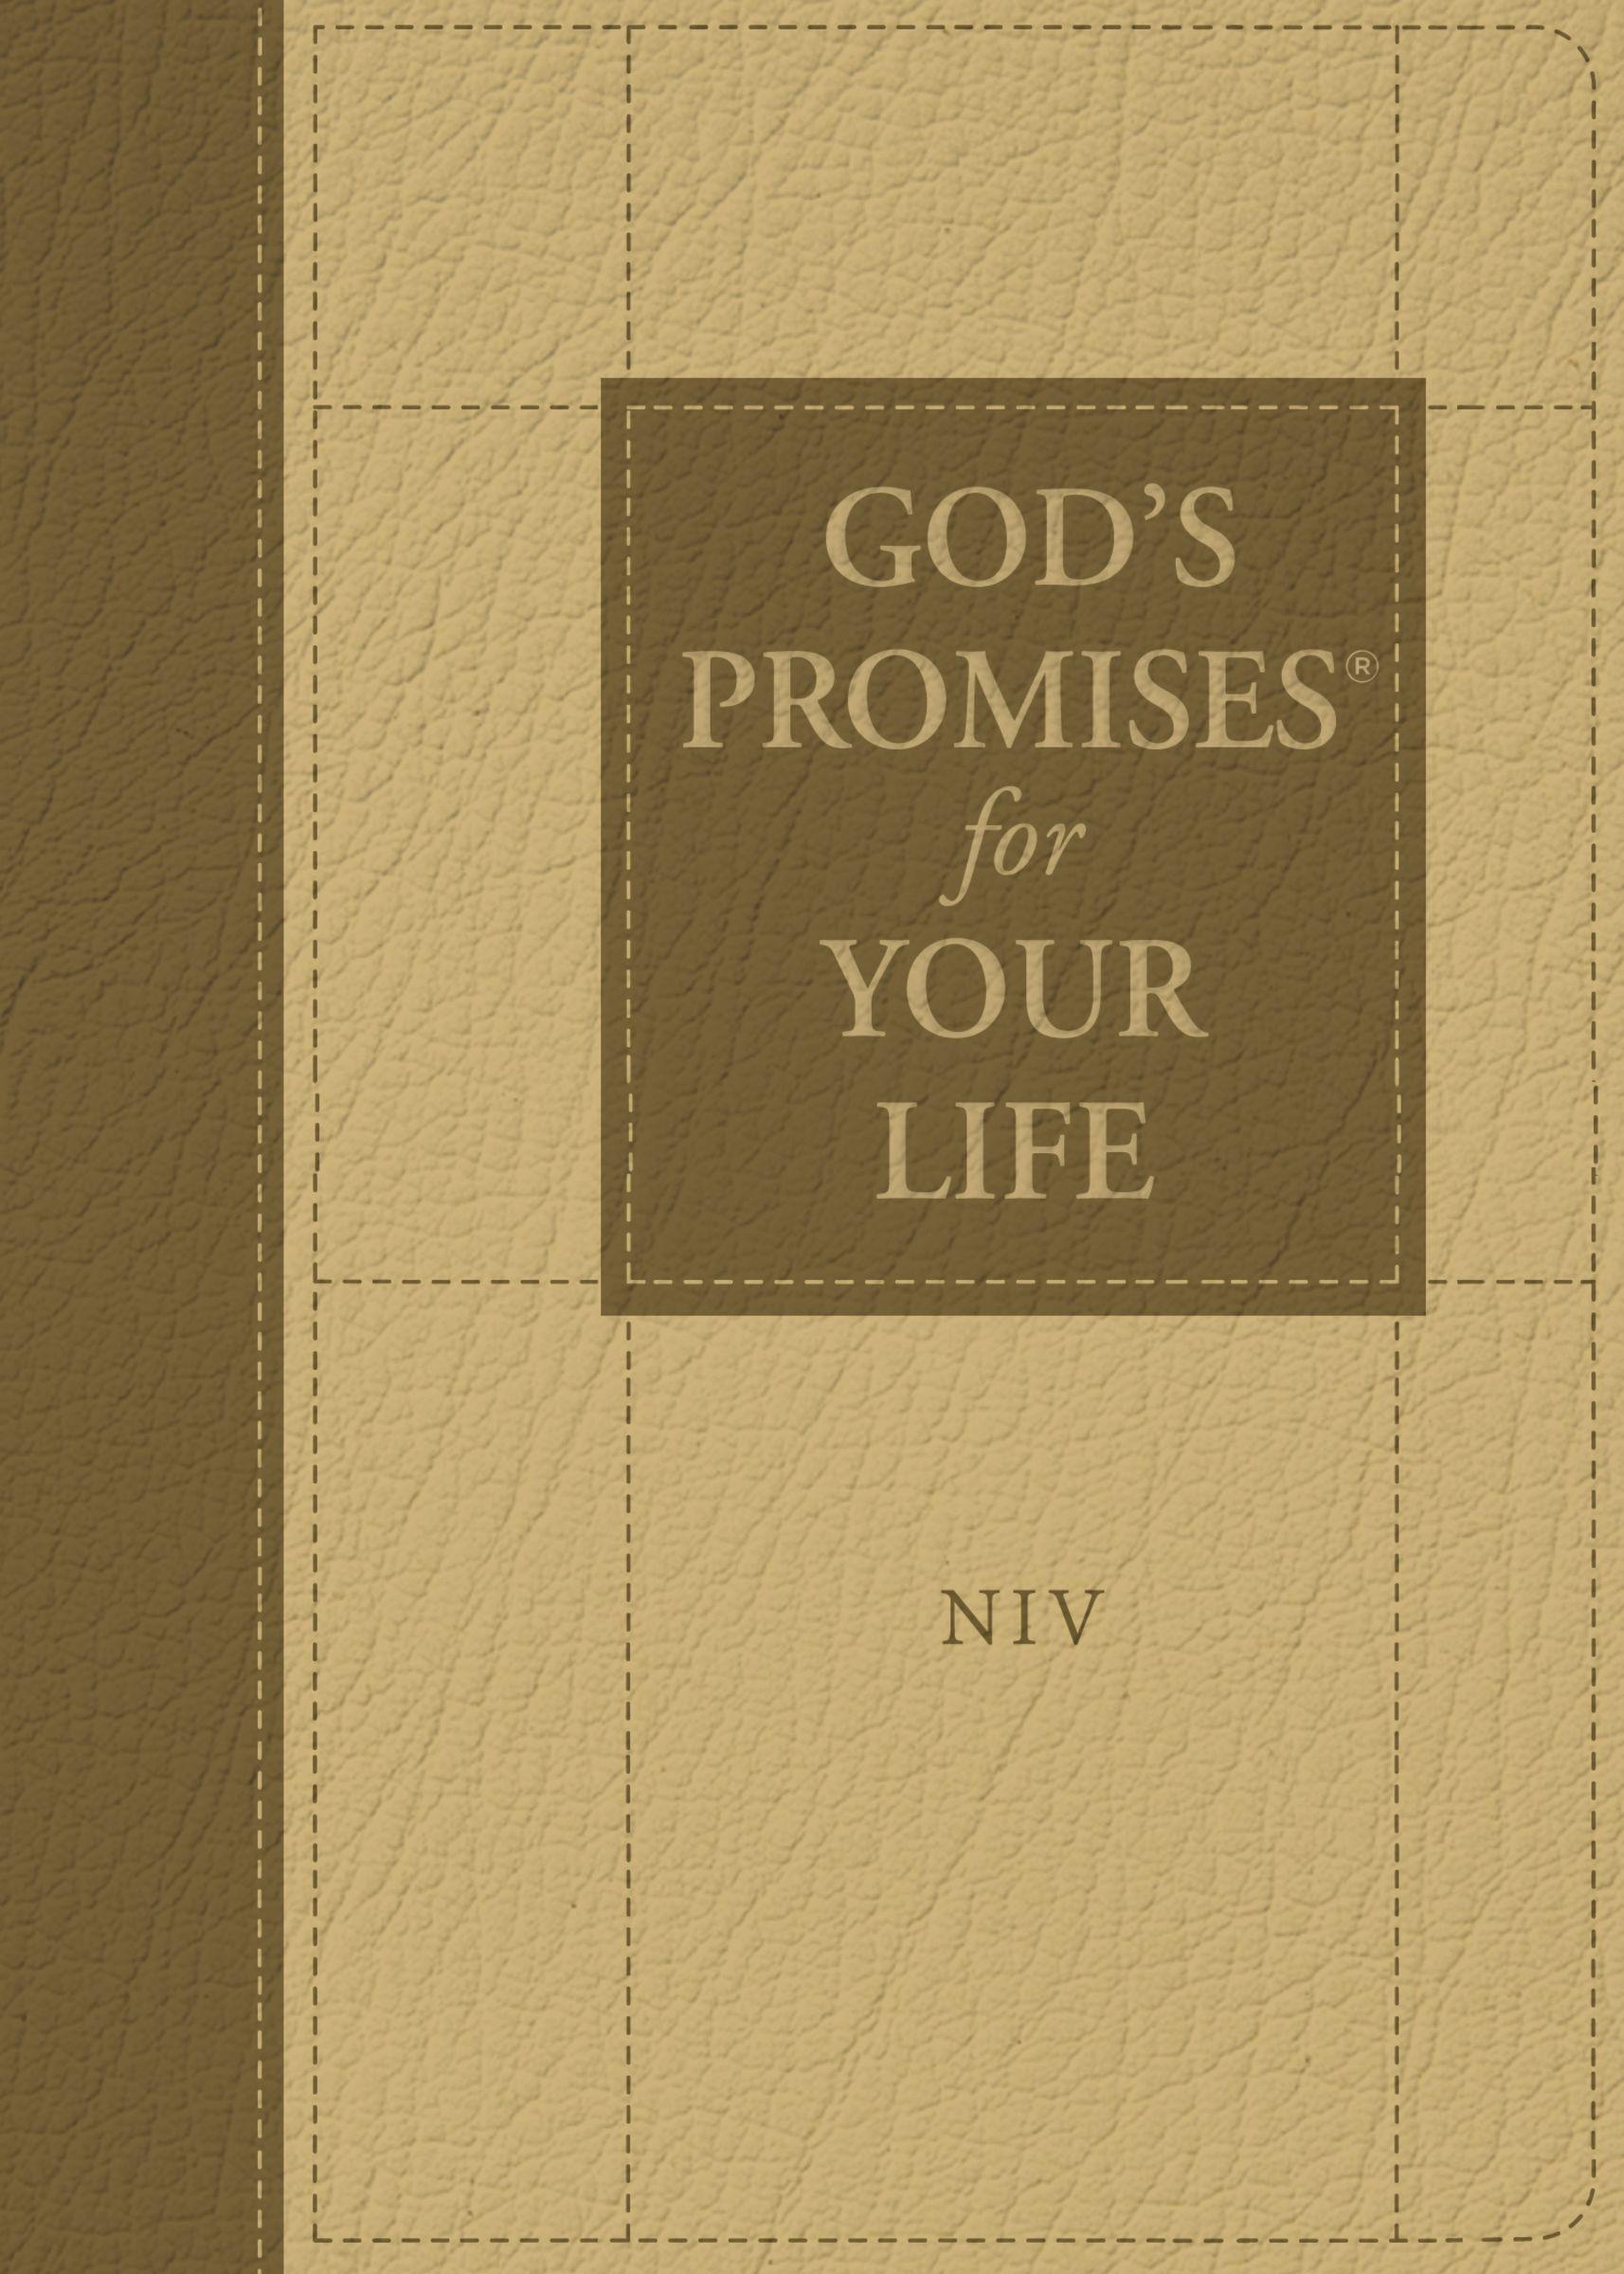 God's Promises for Your Life- NIV